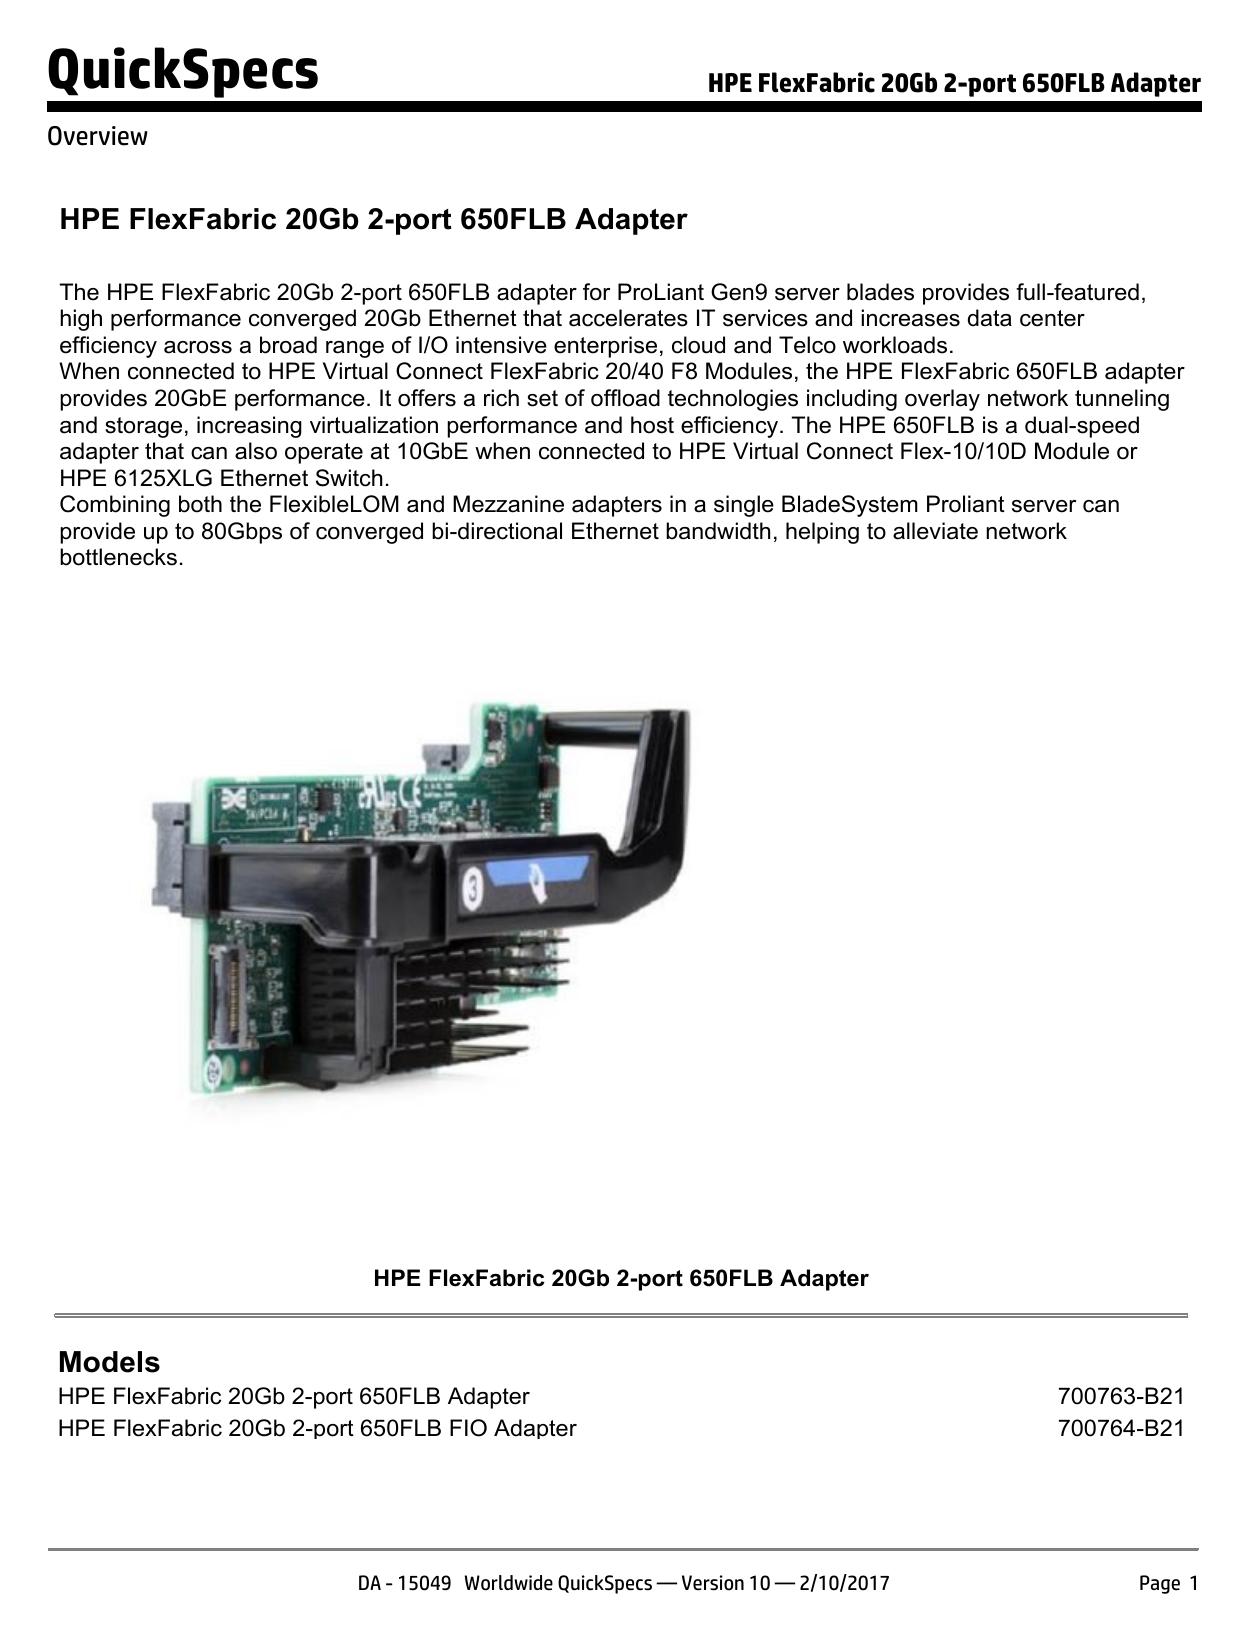 hp flexfabric 20gb 2-port 650flb adapter driver